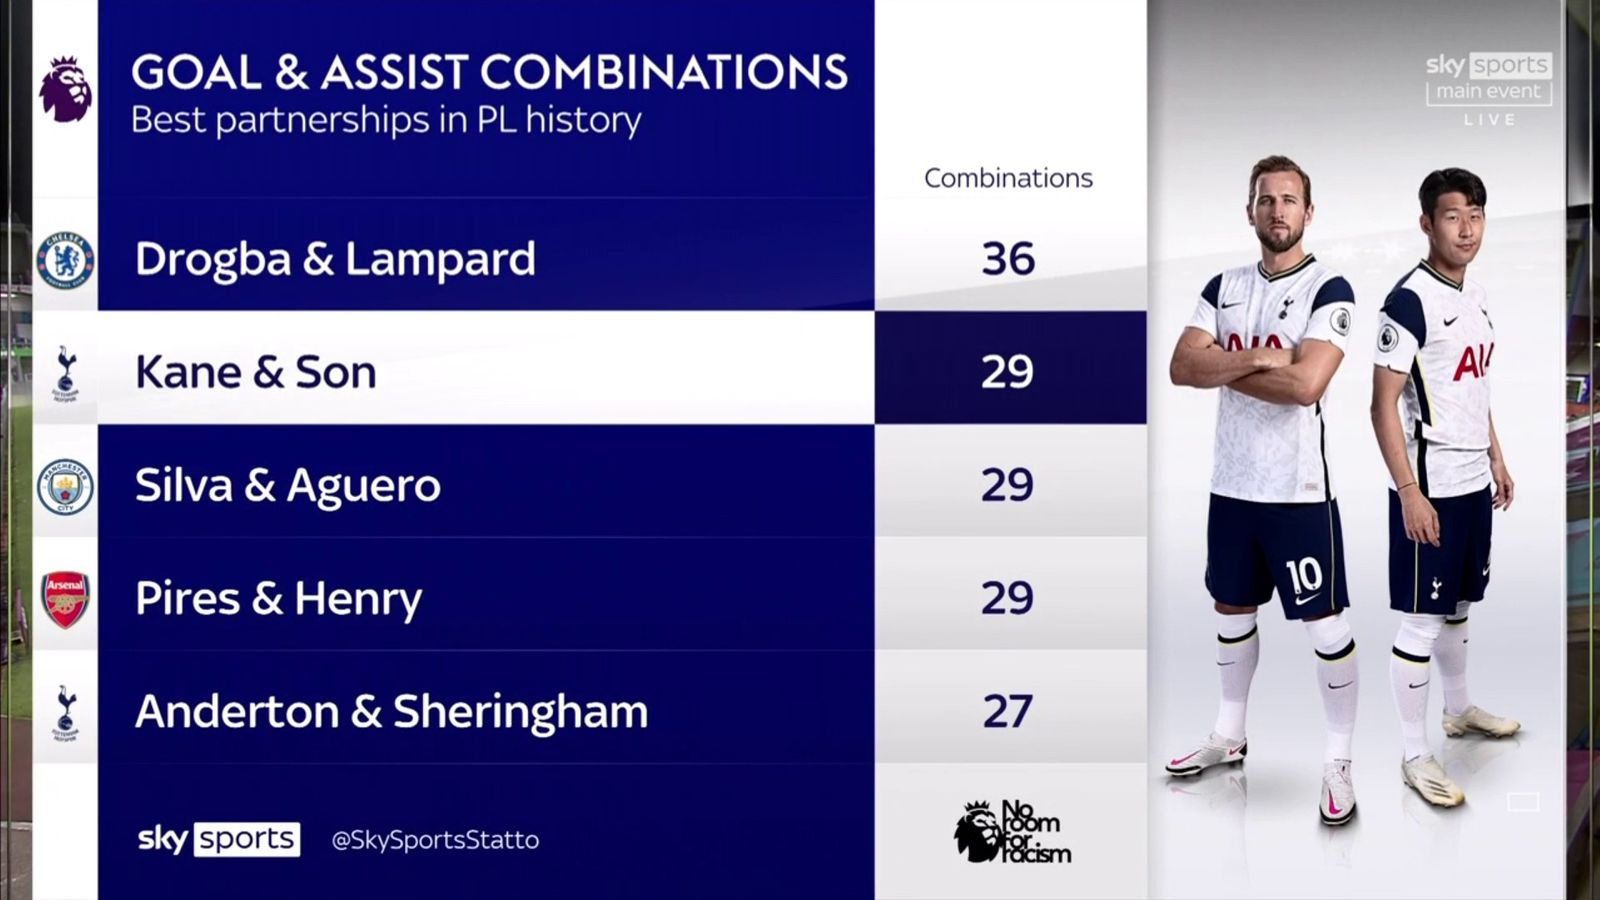 Kombinasi duet maut dalam menghasilkan gol di Liga Premier. (Grafis dan Data dari Sky Sports)